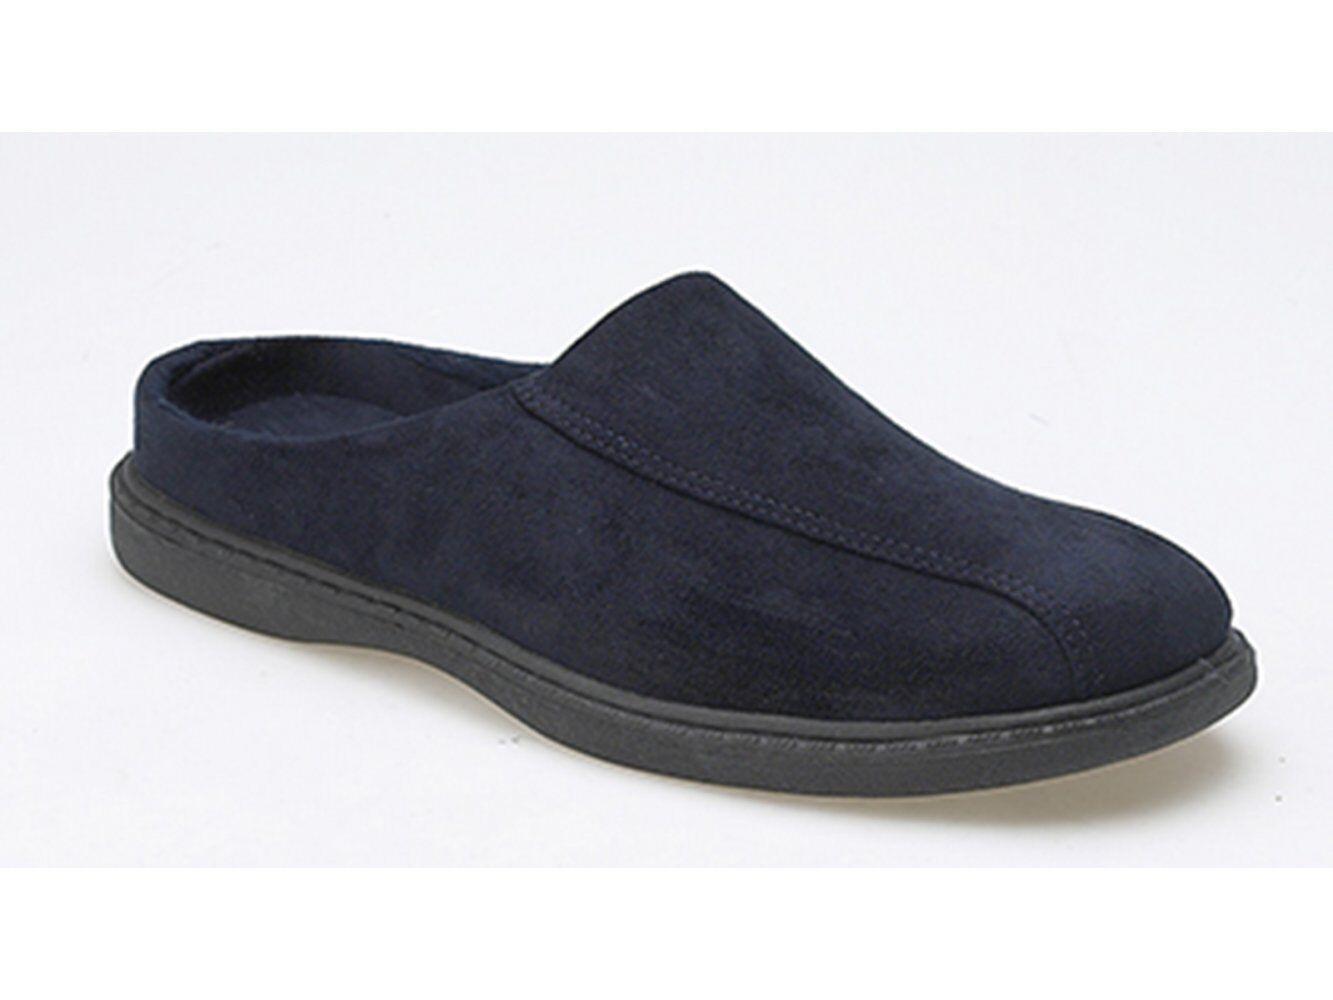 Zedzzz JARROW Mens Textile Rubber Sole Slip On Comfy Mule Slippers Navy bluee